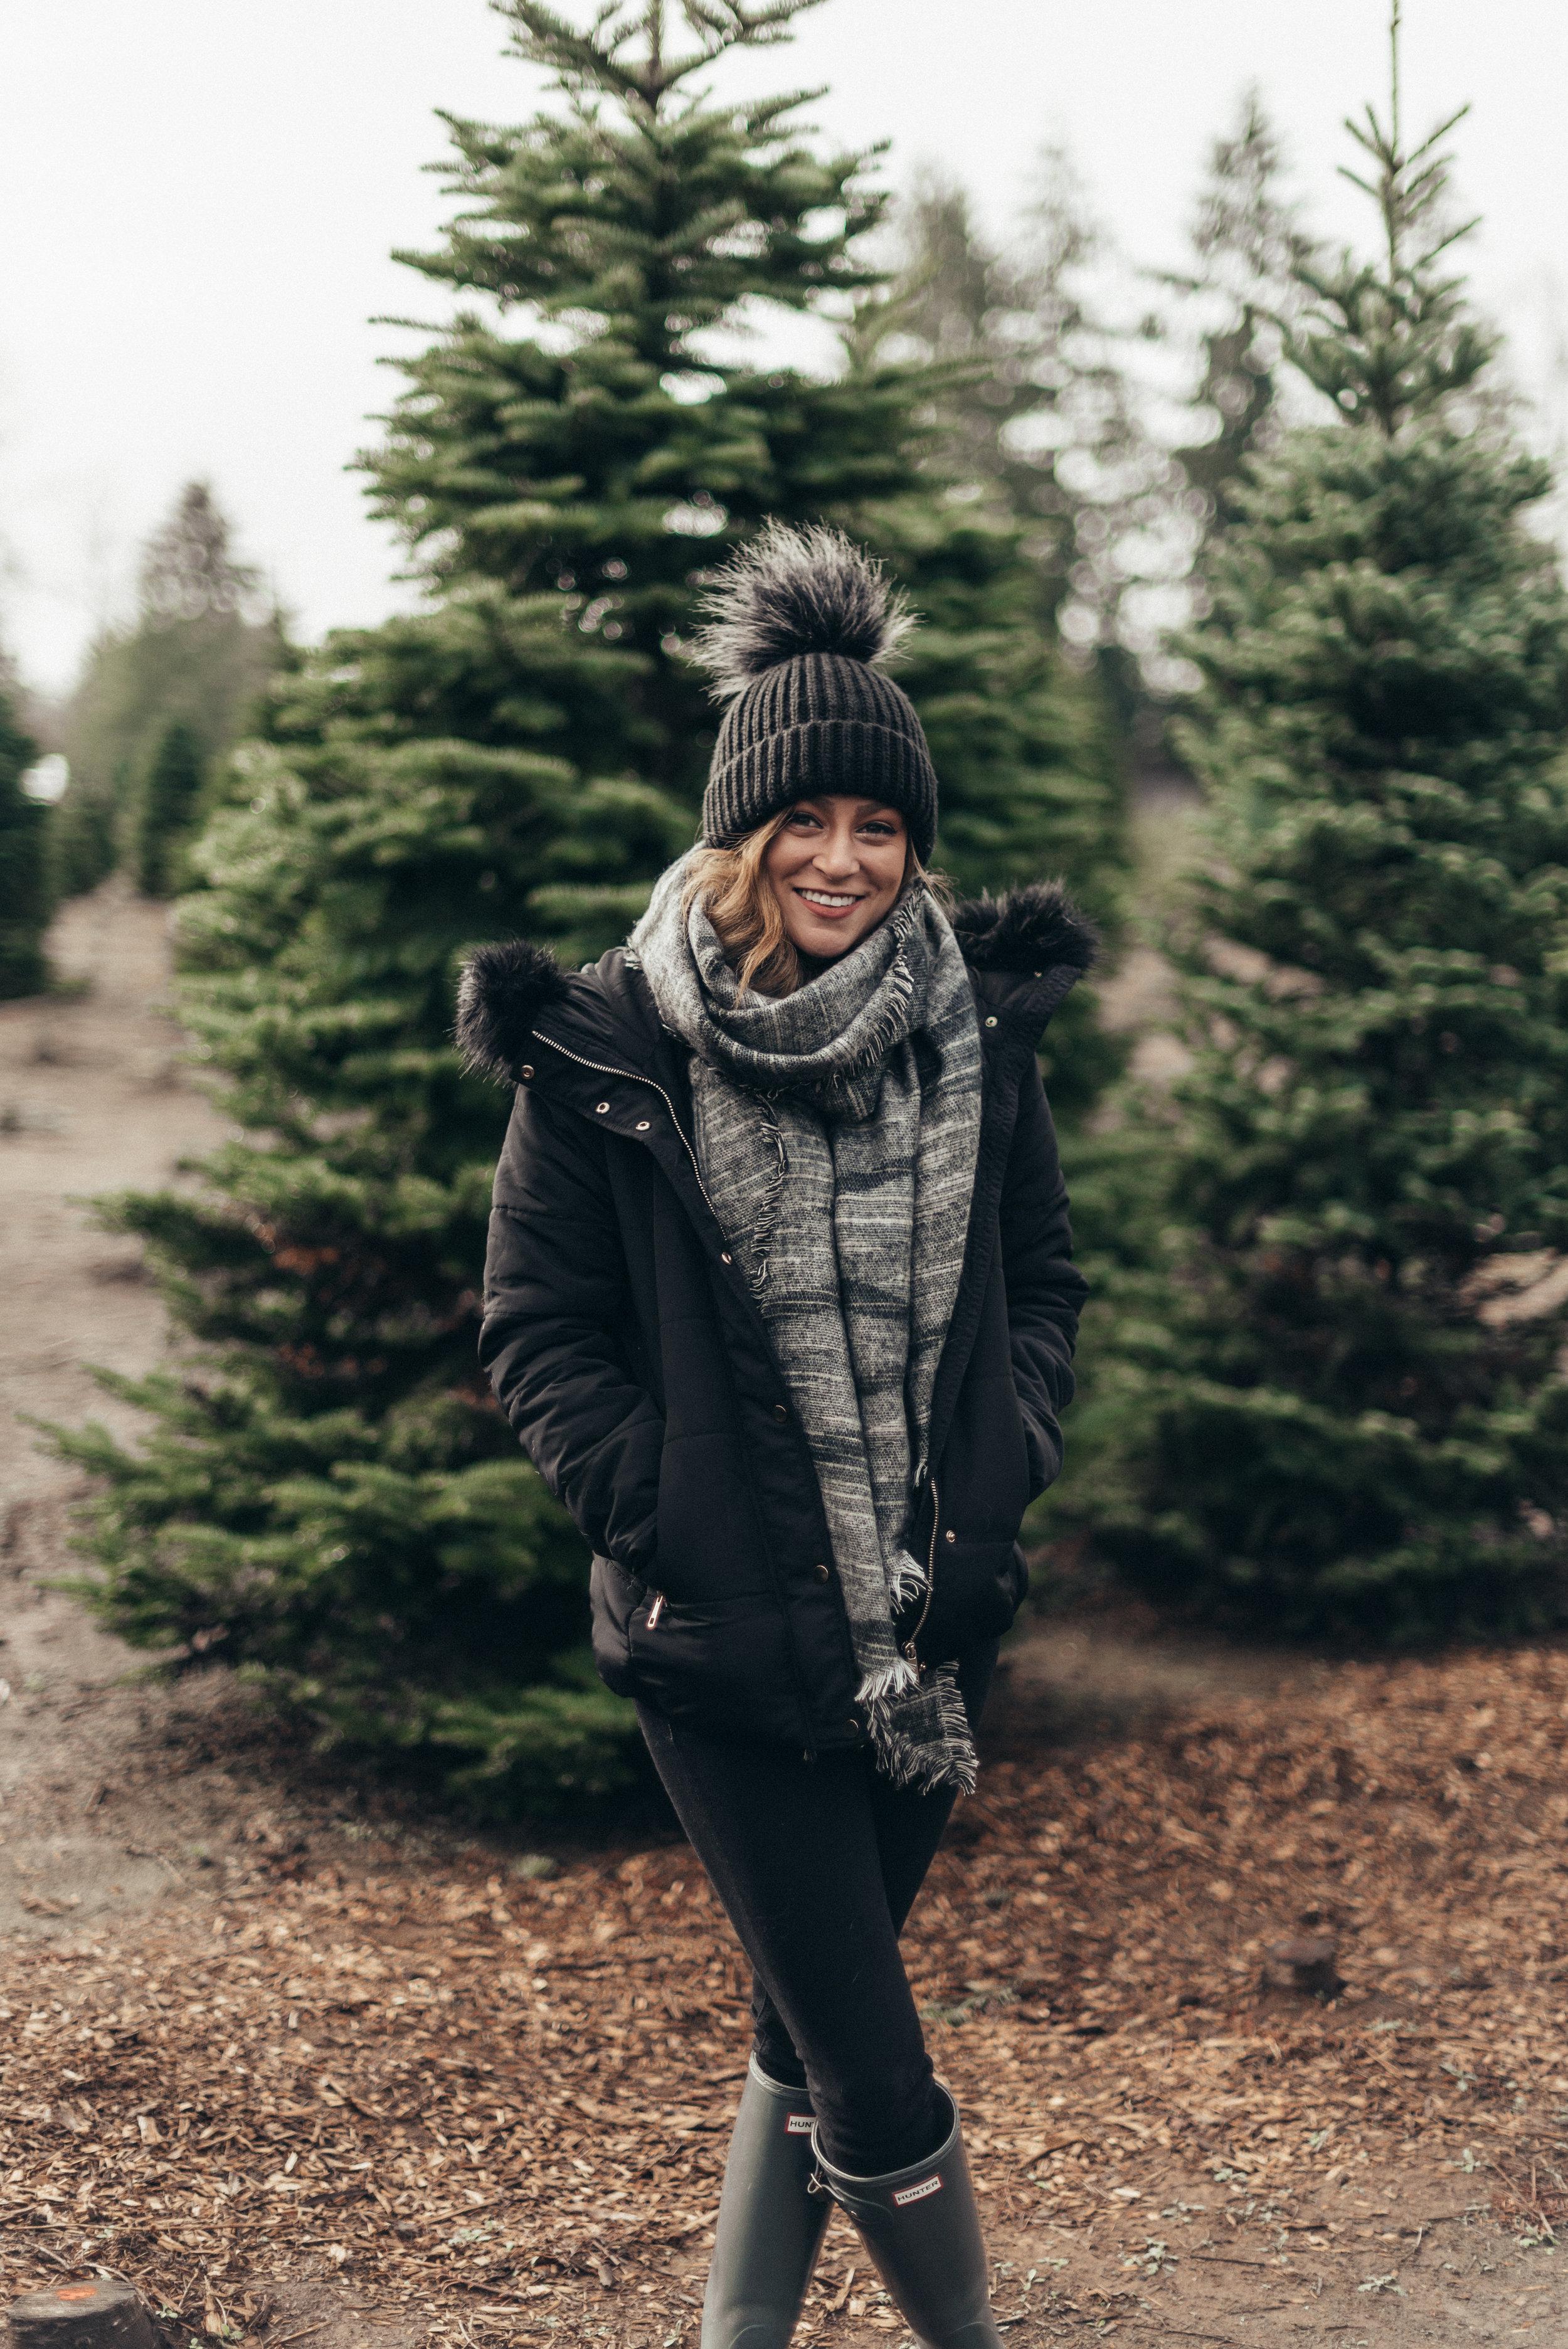 ChristmasTree-4.jpg